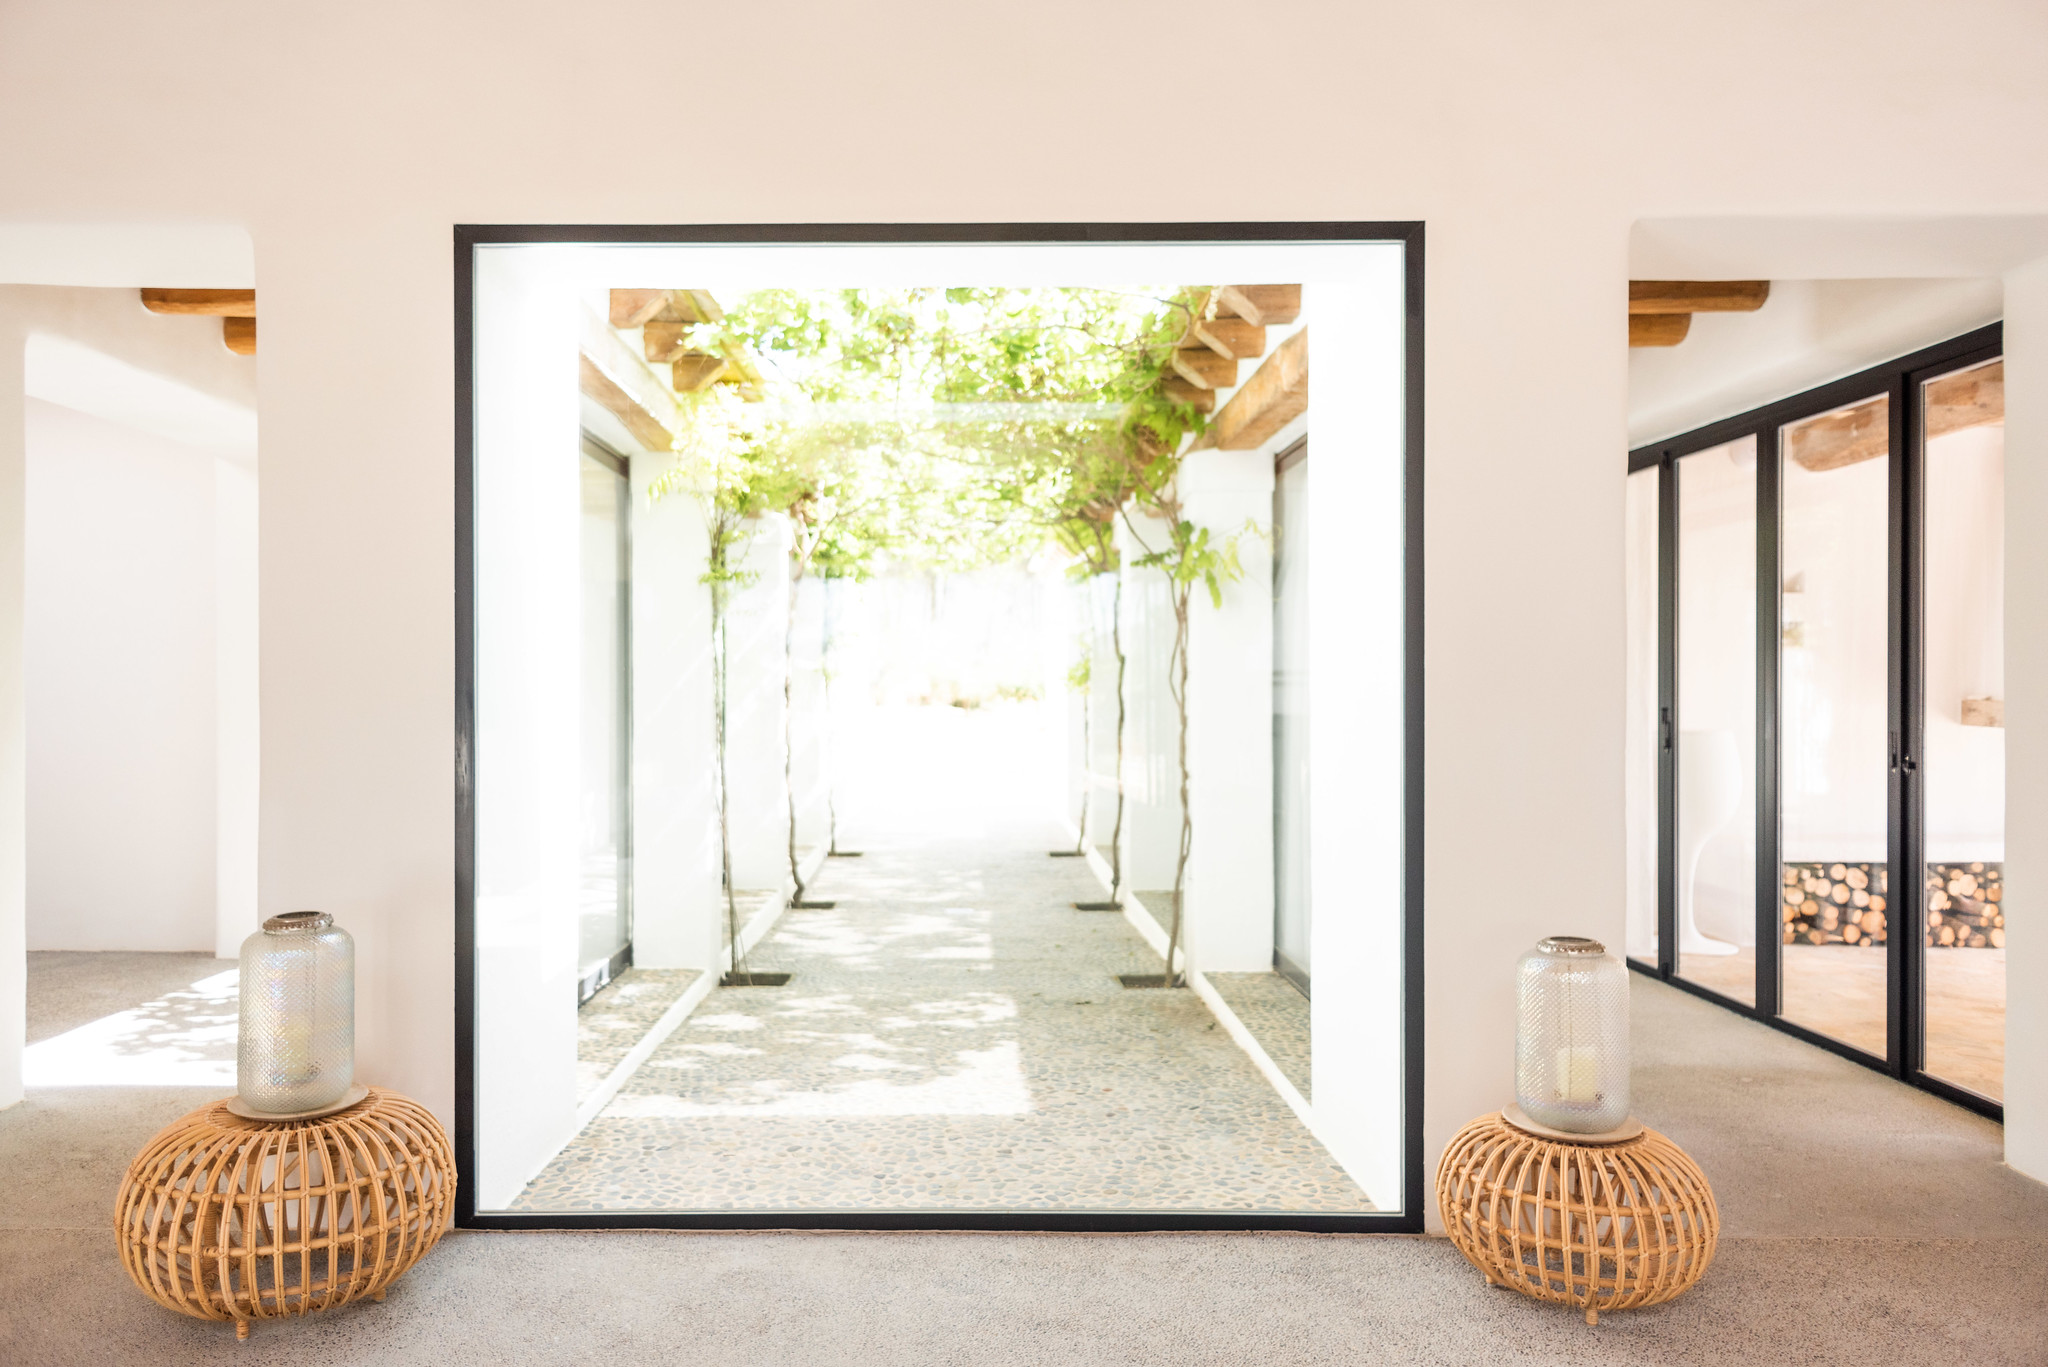 https://www.white-ibiza.com/wp-content/uploads/2020/05/white-ibiza-villas-can-terra-atrium.jpg